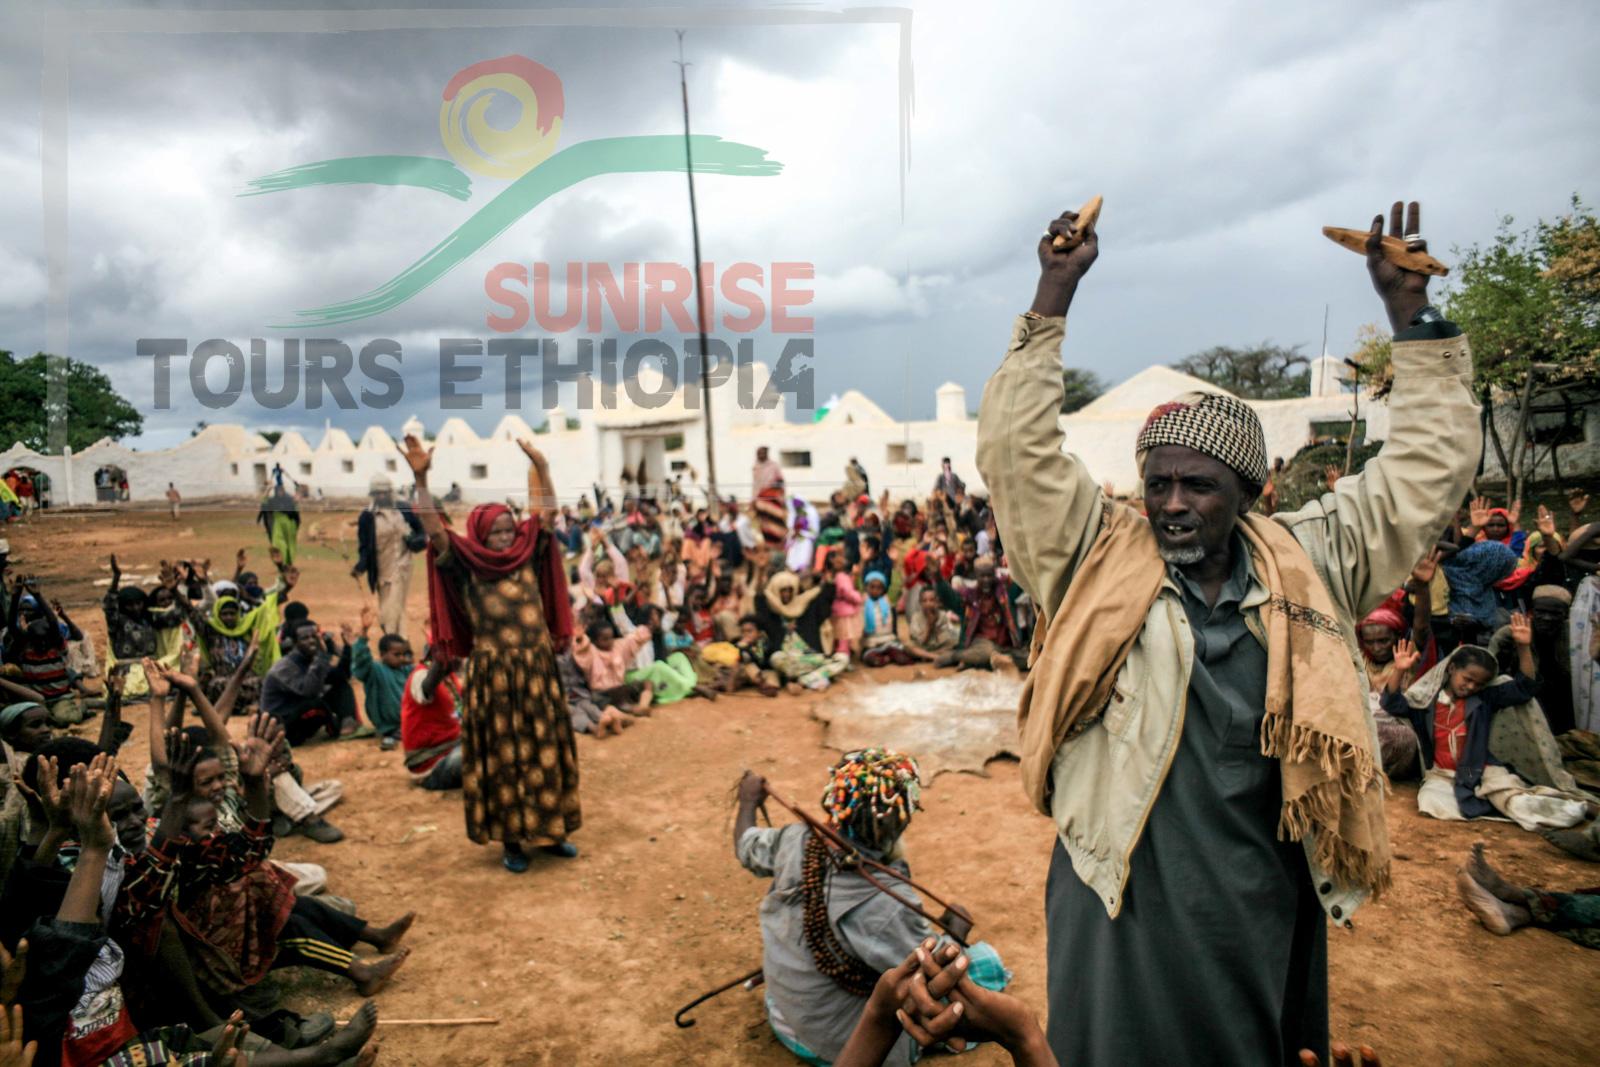 SHEICK HUSSEIN CELEBRATION ETHIOPIA SUFI MUSLIM